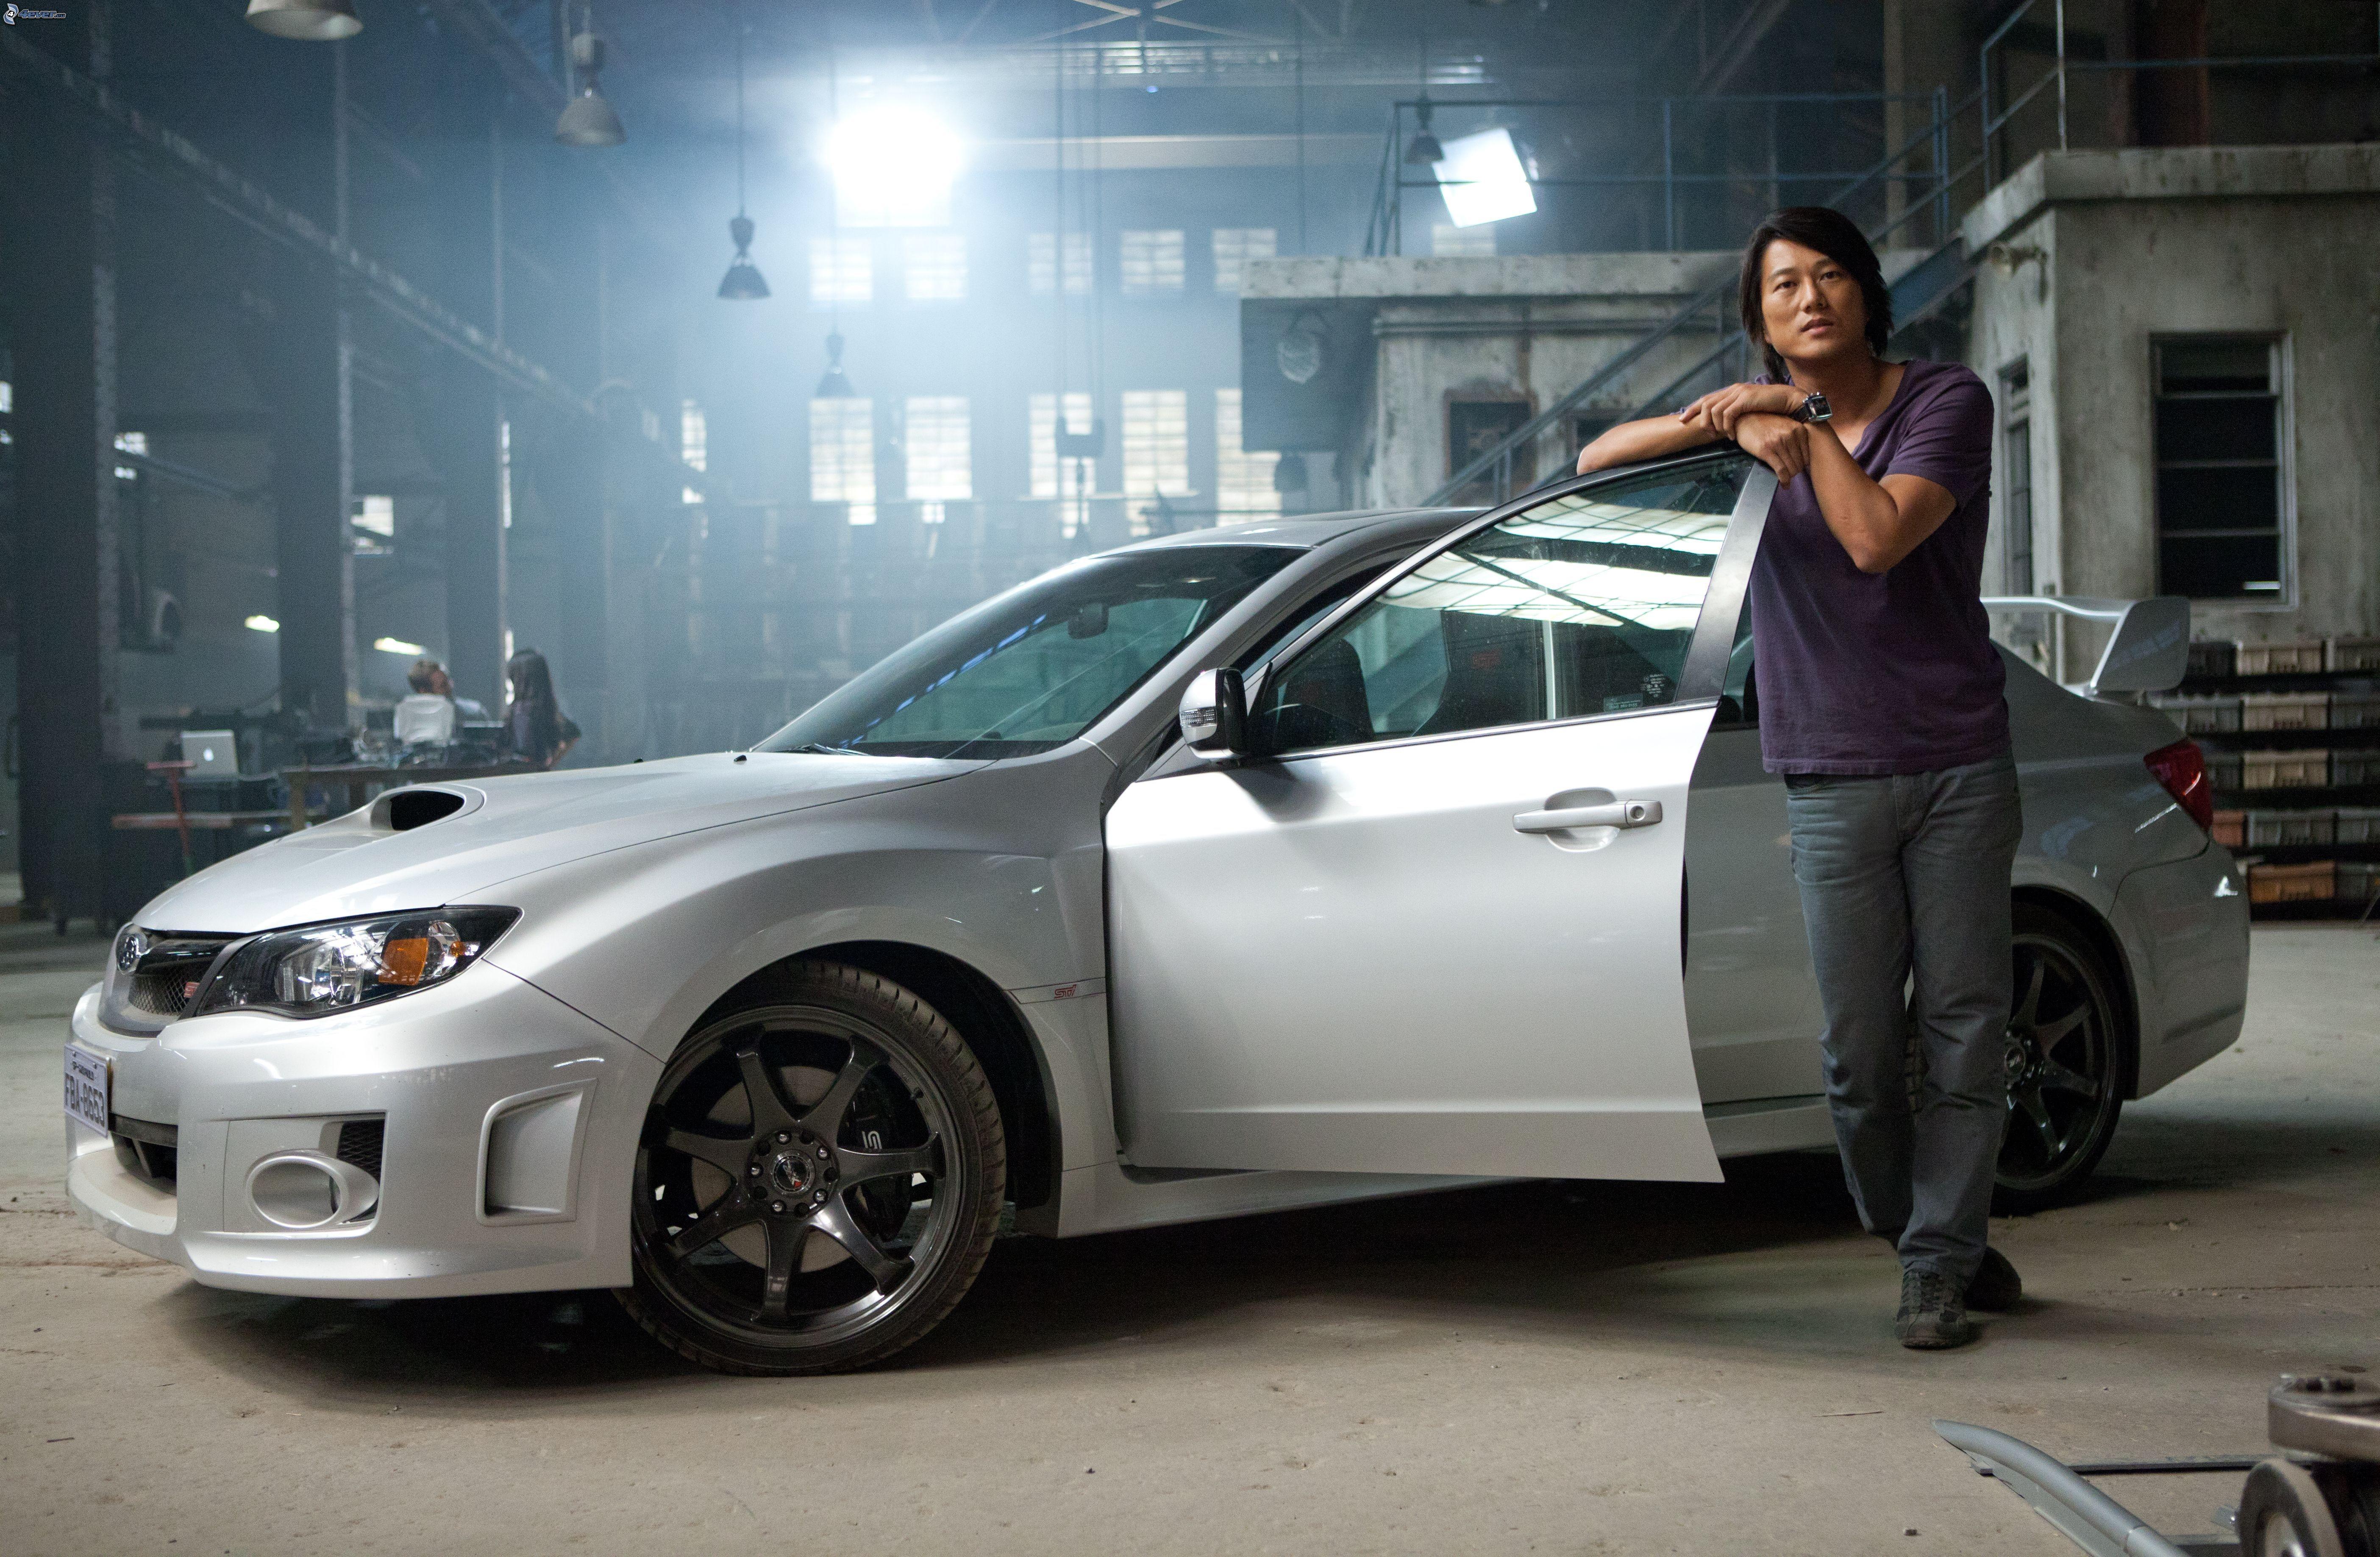 2011 Subaru Impreza Wrx Sti The Fast And The Furious Wiki Fandom